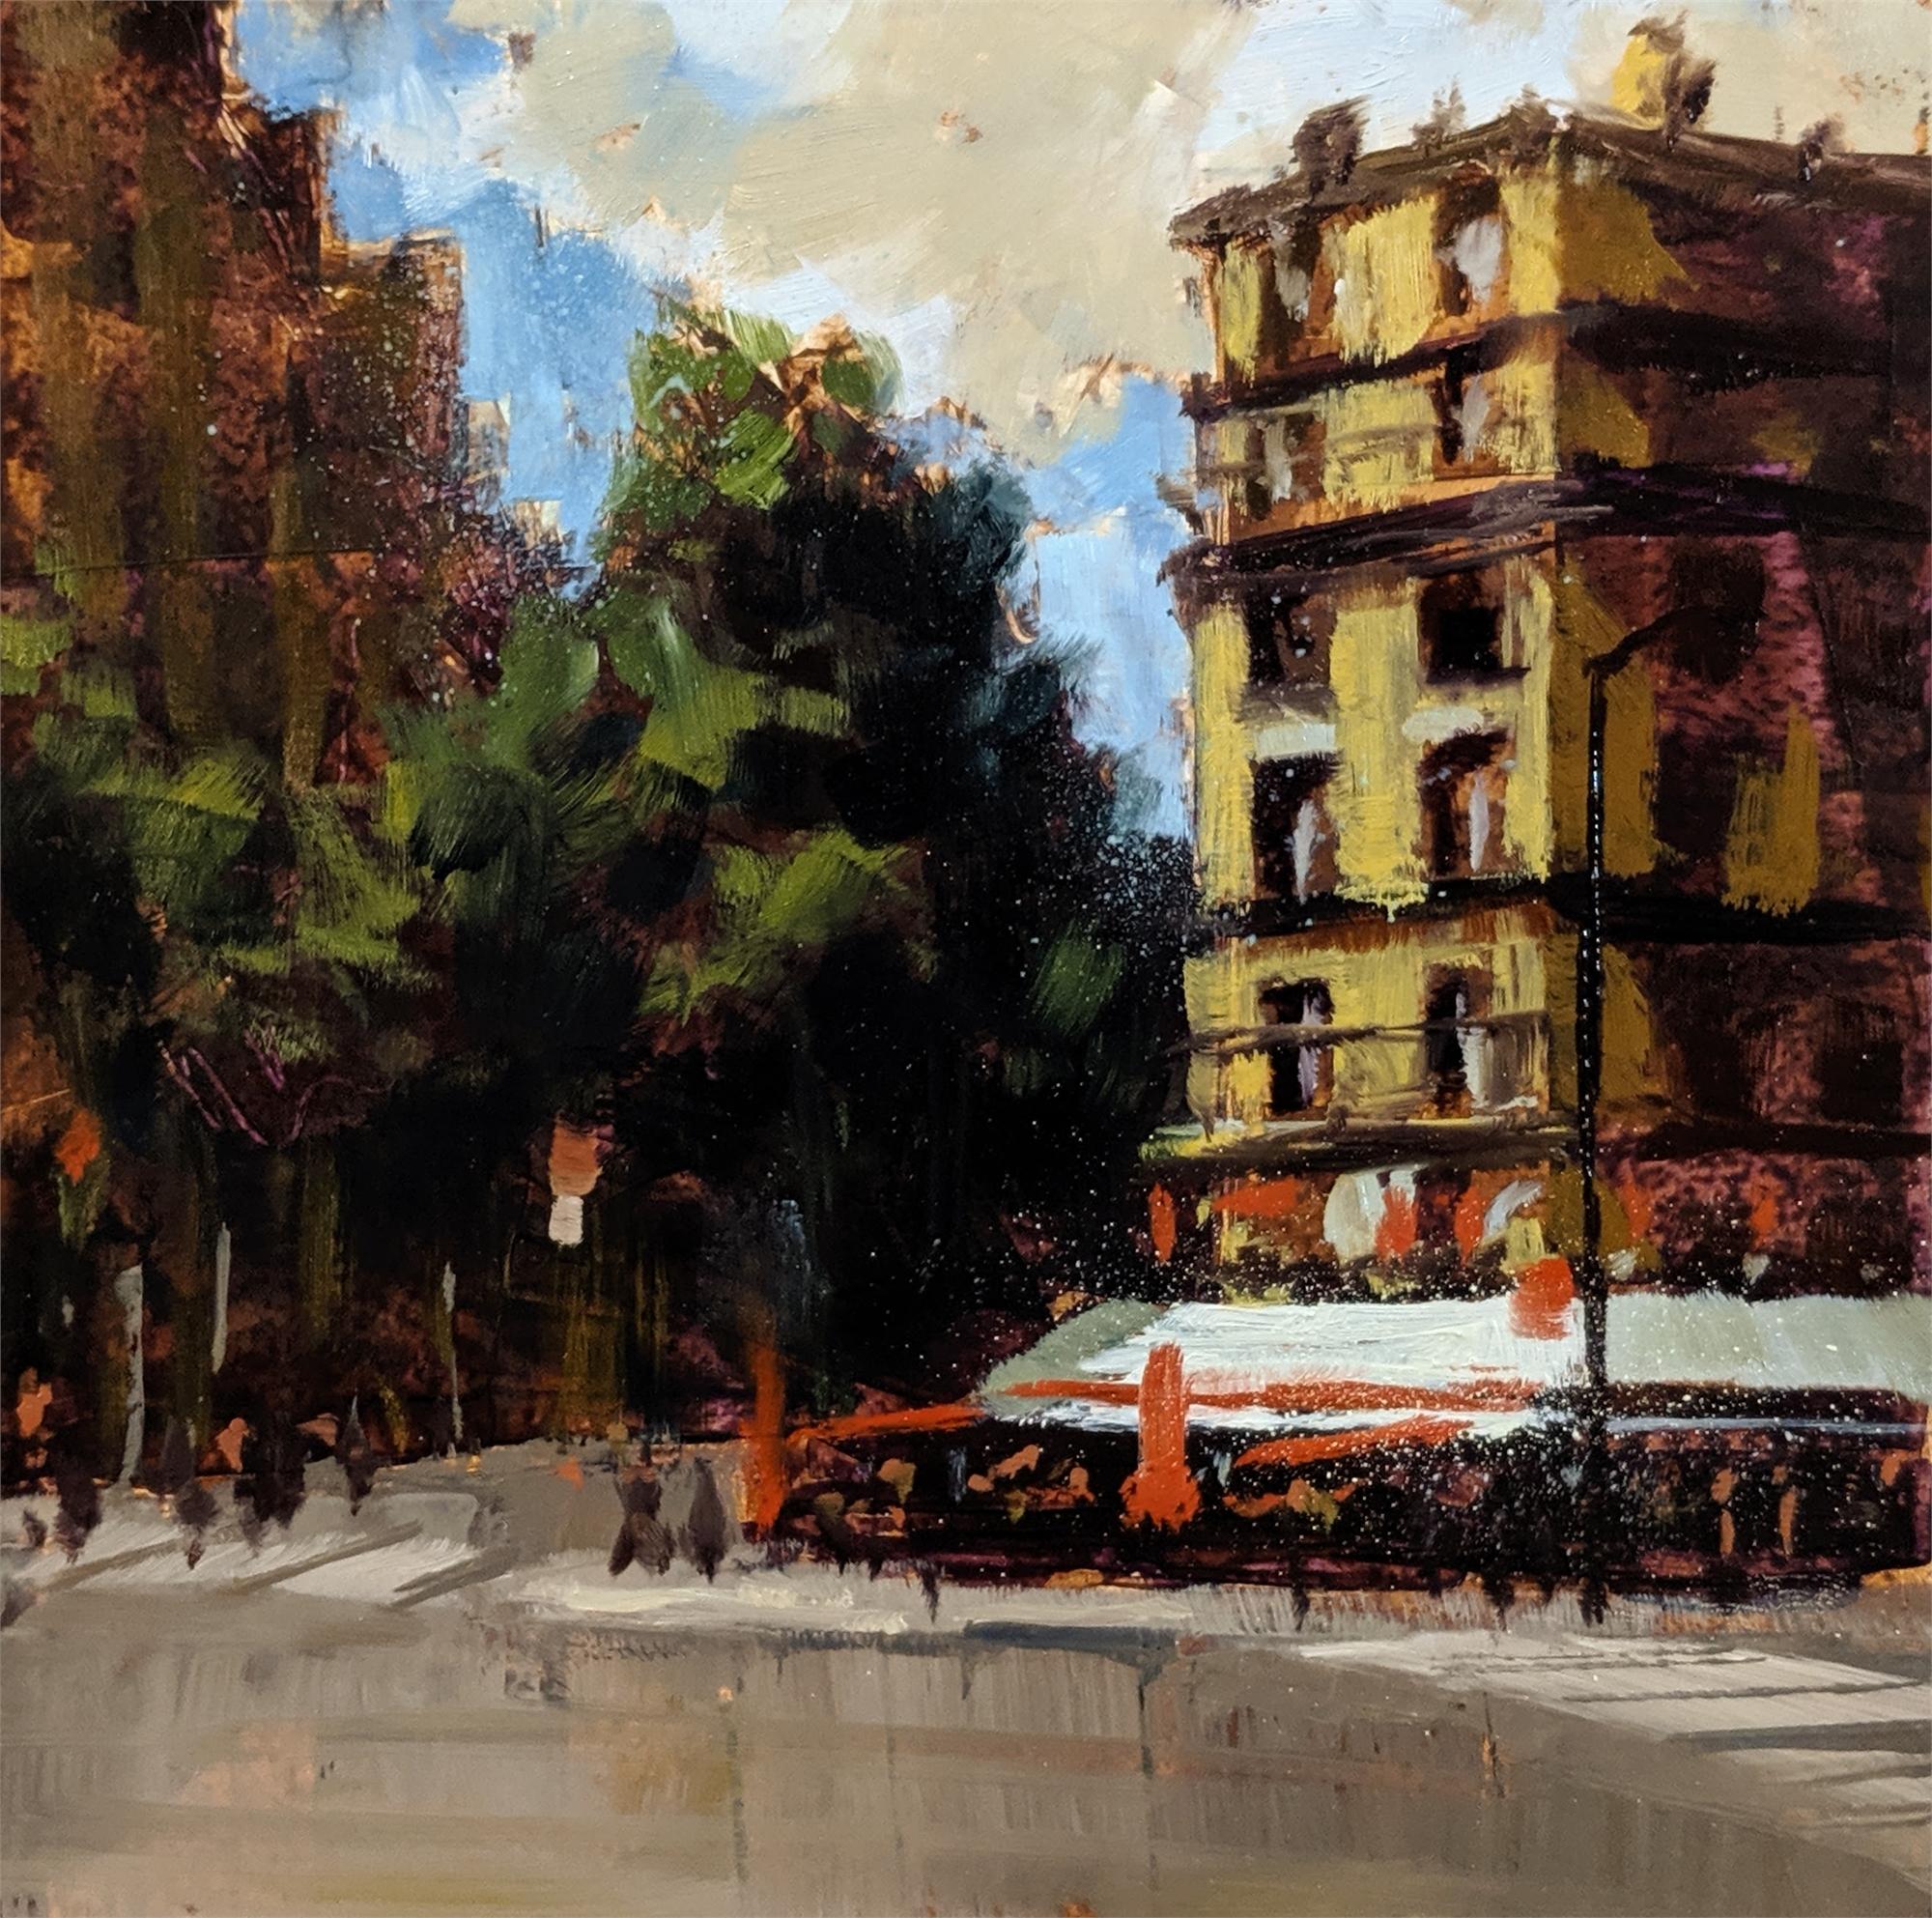 Story of Paris, Vol I, No. 13 by Christopher Clark